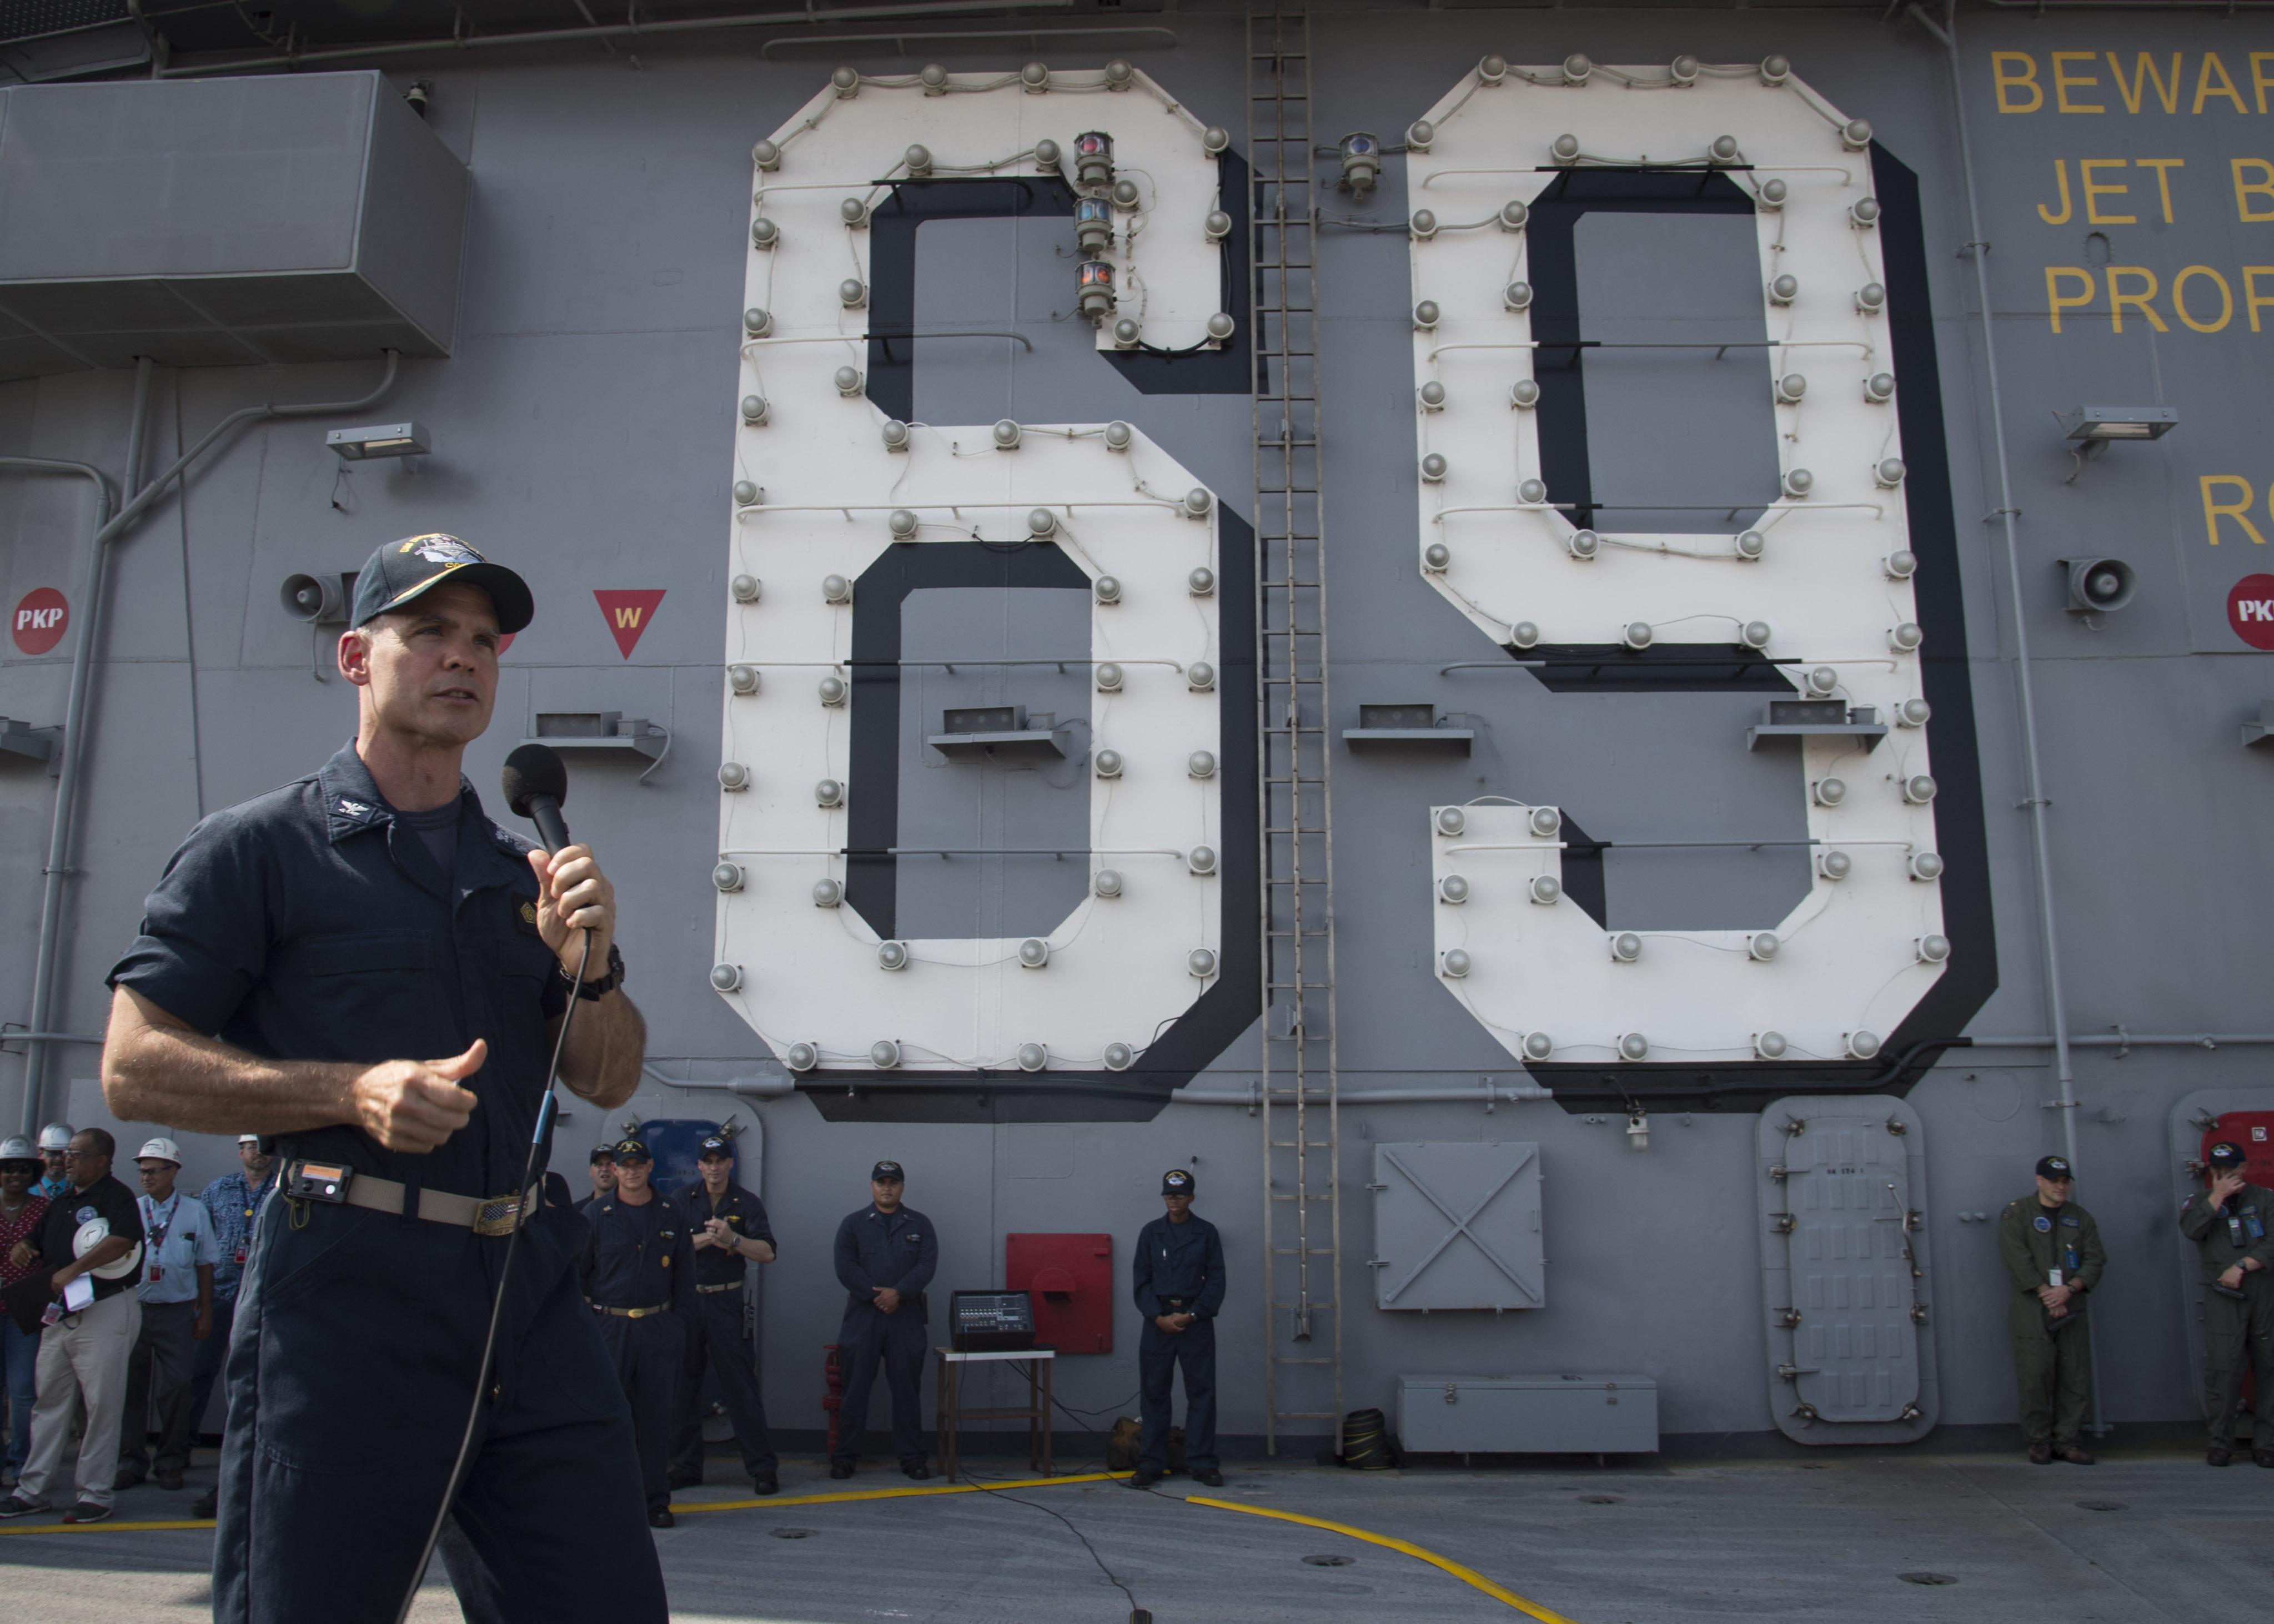 Uss Nimitz Deployment Schedule 2019 USS Dwight D. Eisenhower Repair Period Triples in Length; Carrier